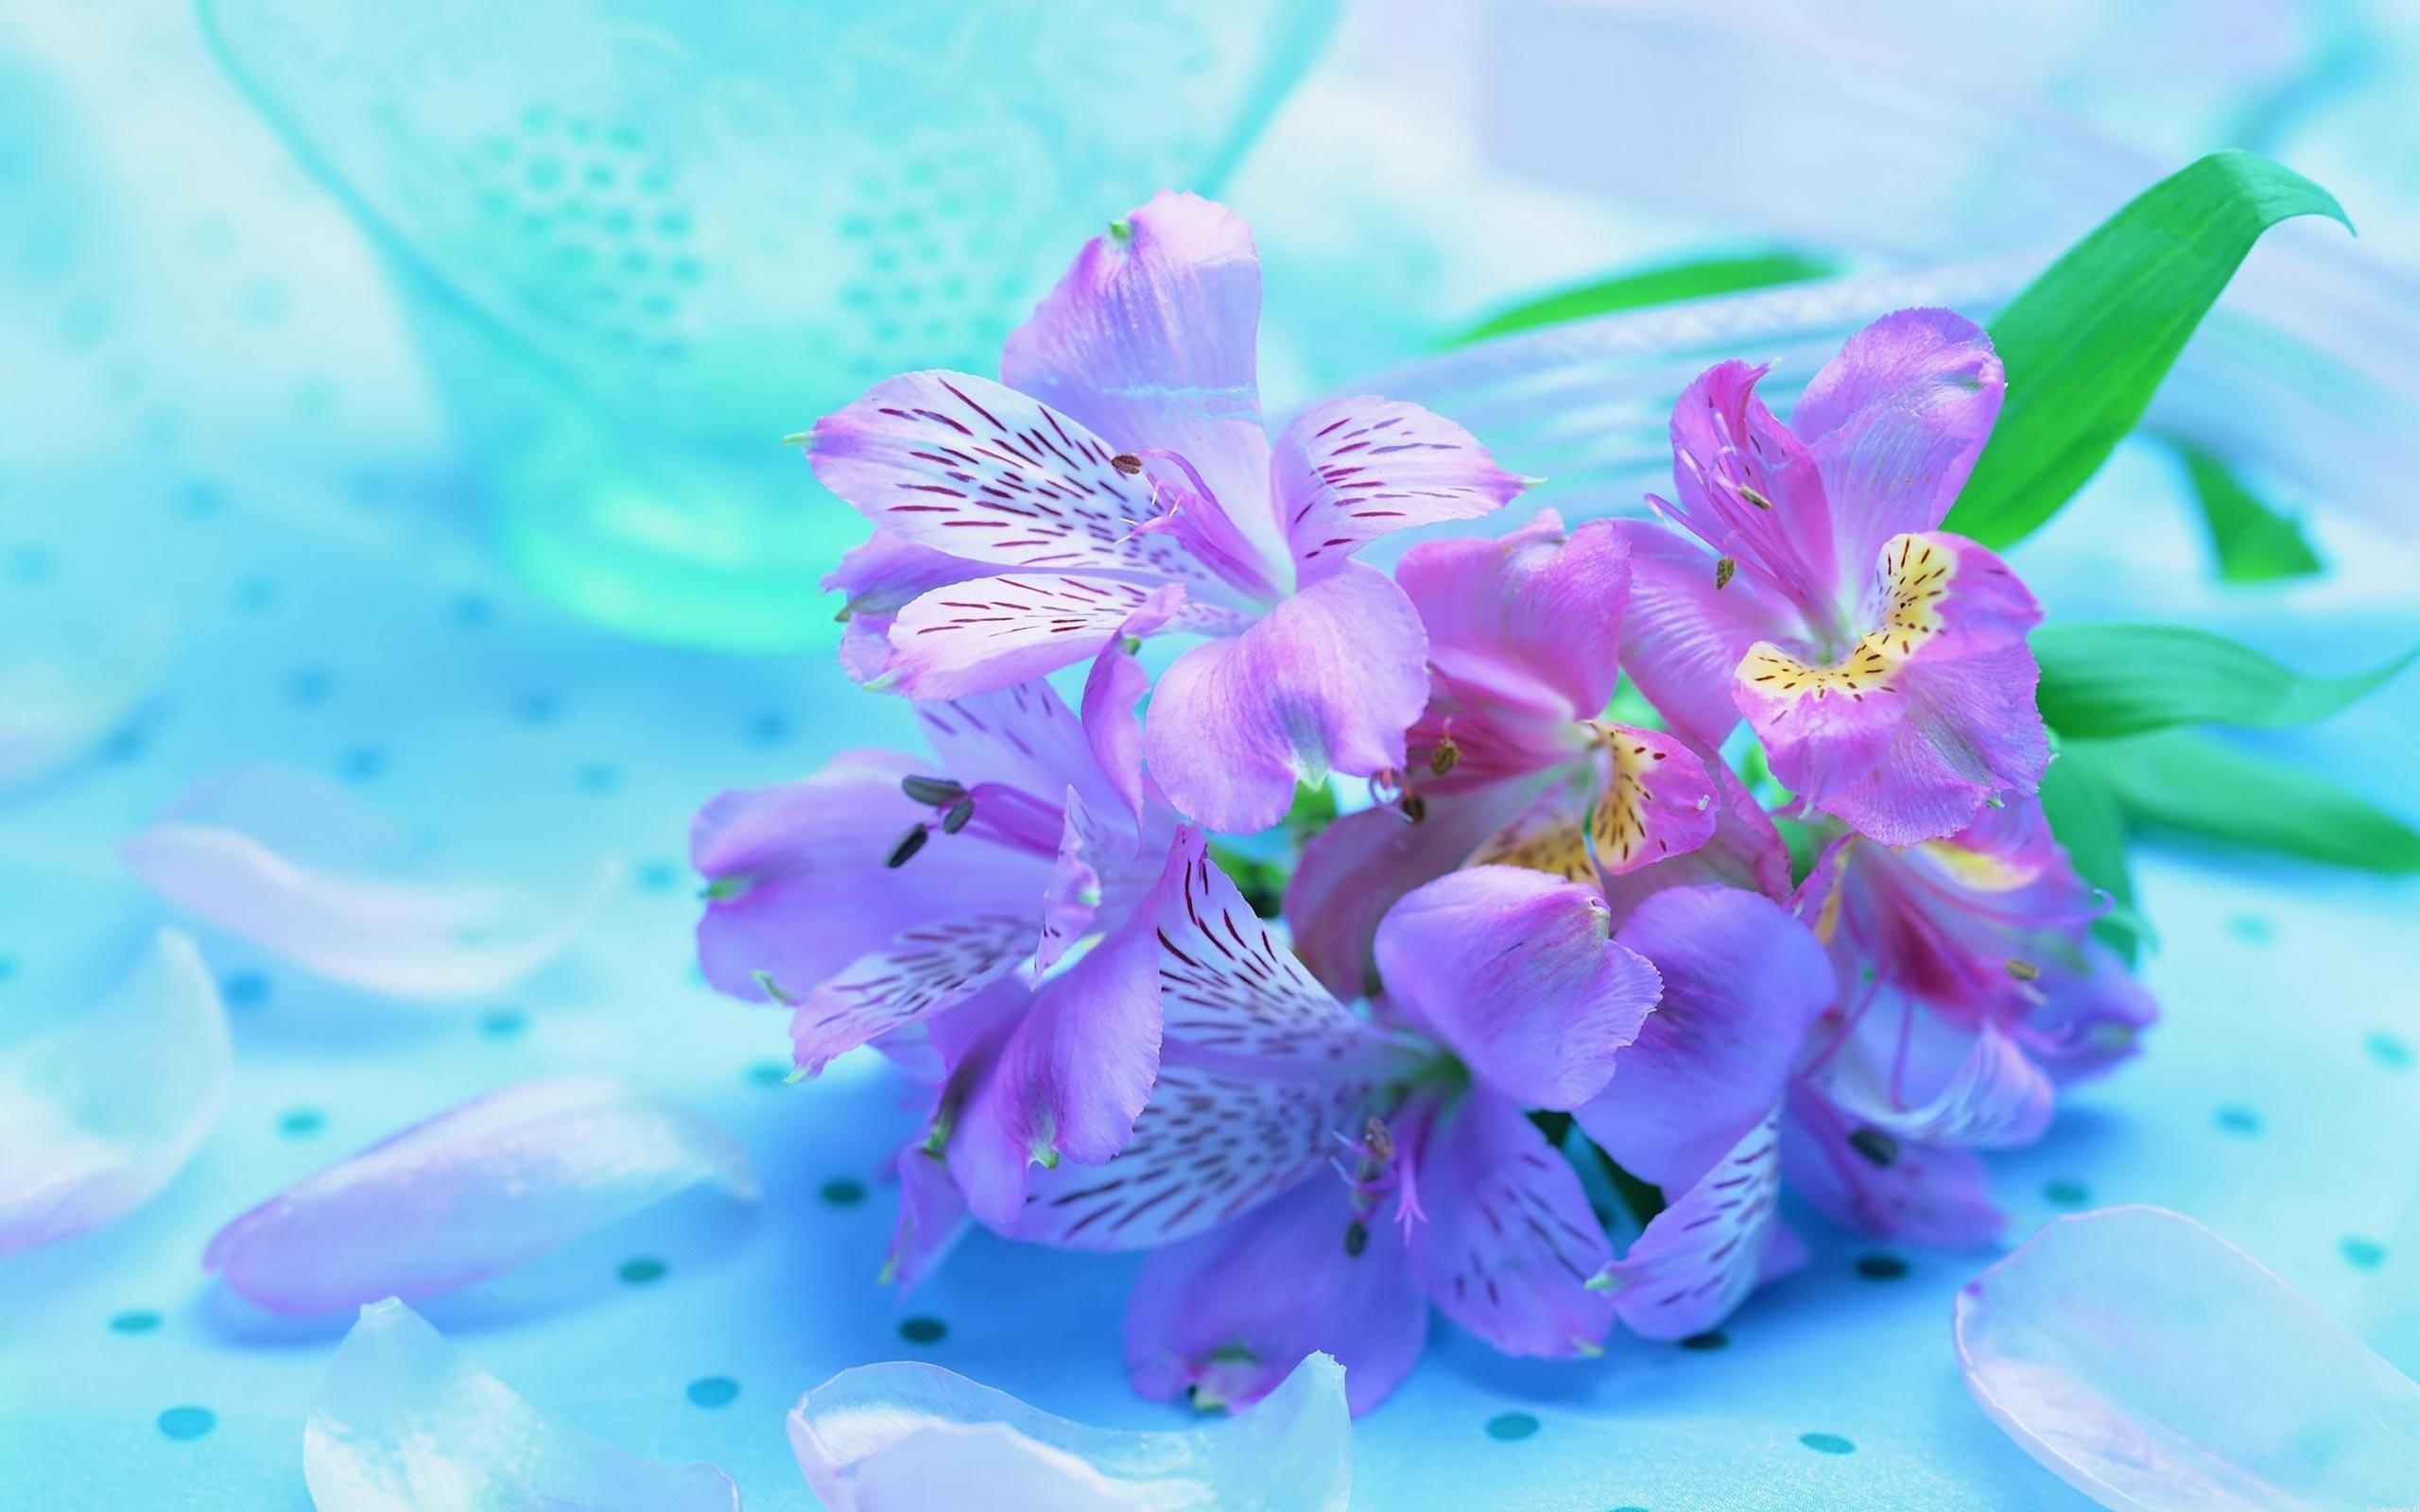 http://hq-wallpapers.ru/wallpapers/15/hq-wallpapers_ru_flowers_70271_2560x1600.jpg